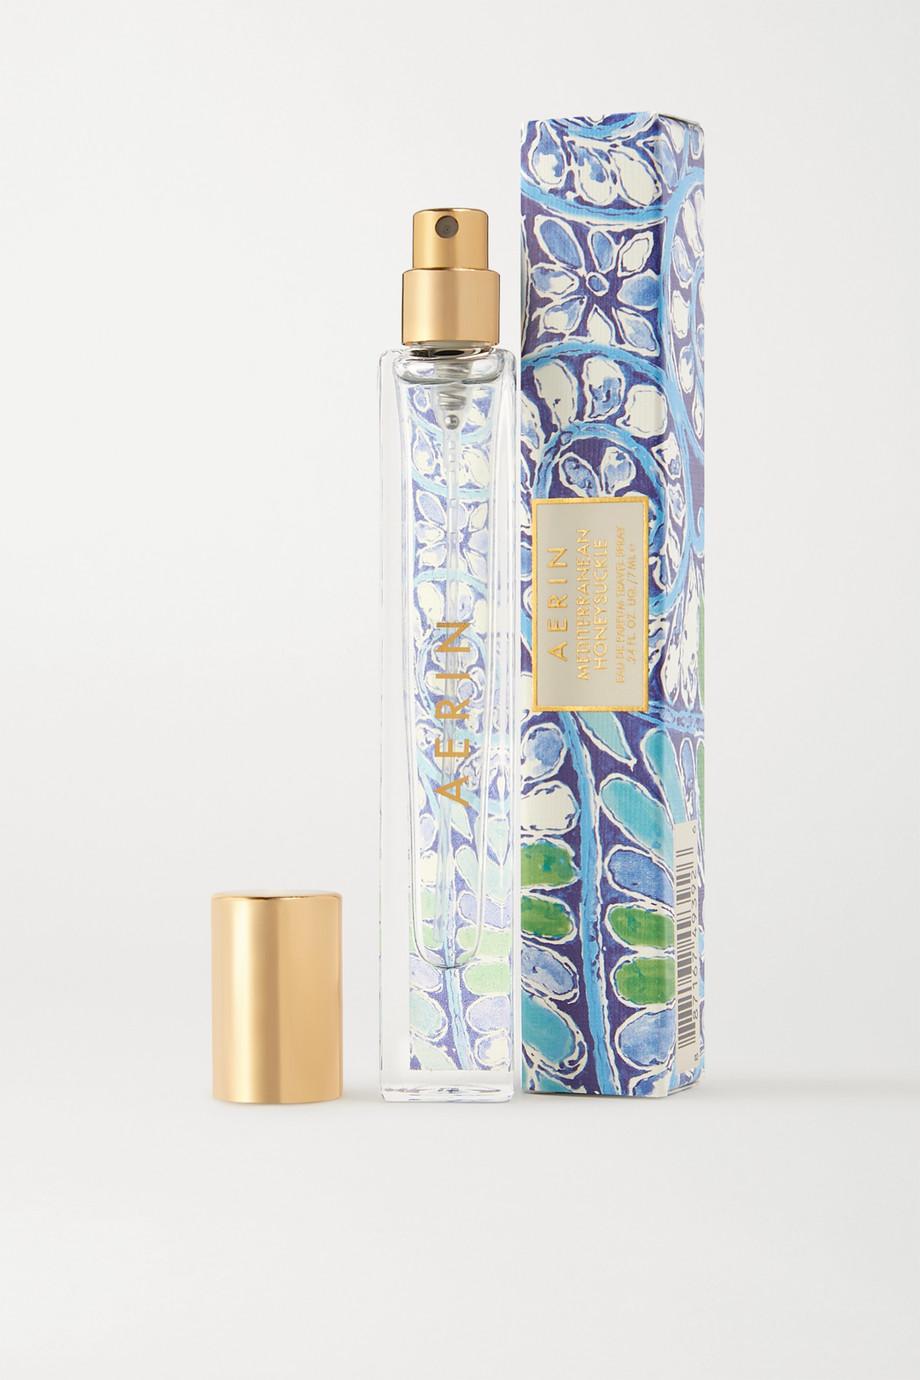 AERIN Beauty Mediterranean Honeysuckle, 7 ml – Eau de Parfum